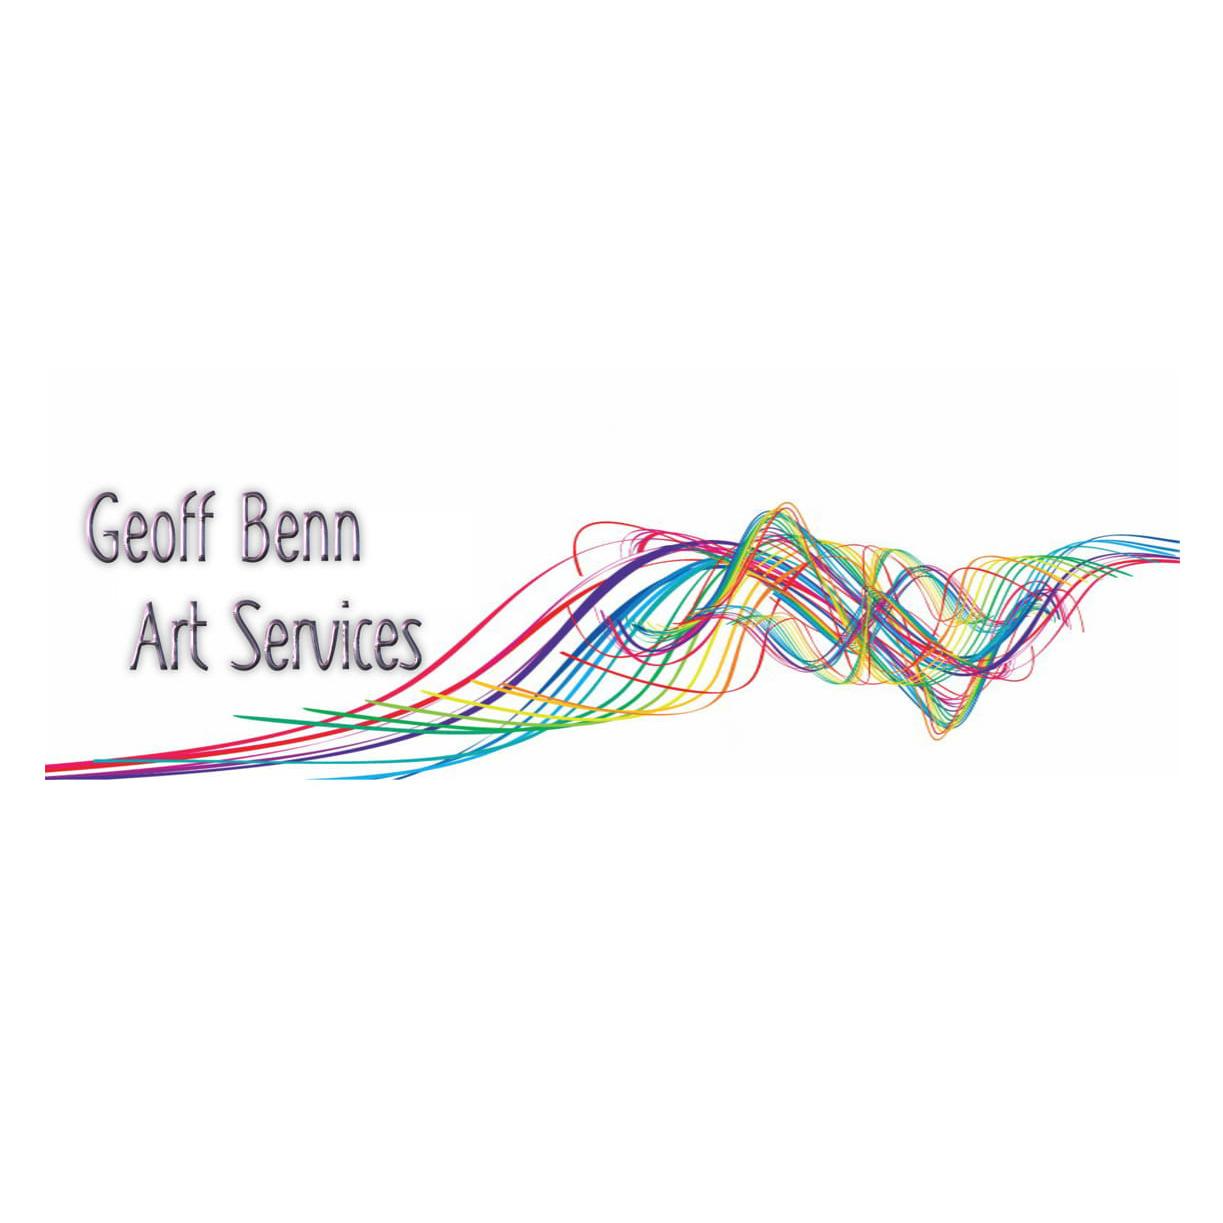 Geoff Benn Art Services - Doncaster, South Yorkshire DN6 7HT - 01302 271262 | ShowMeLocal.com